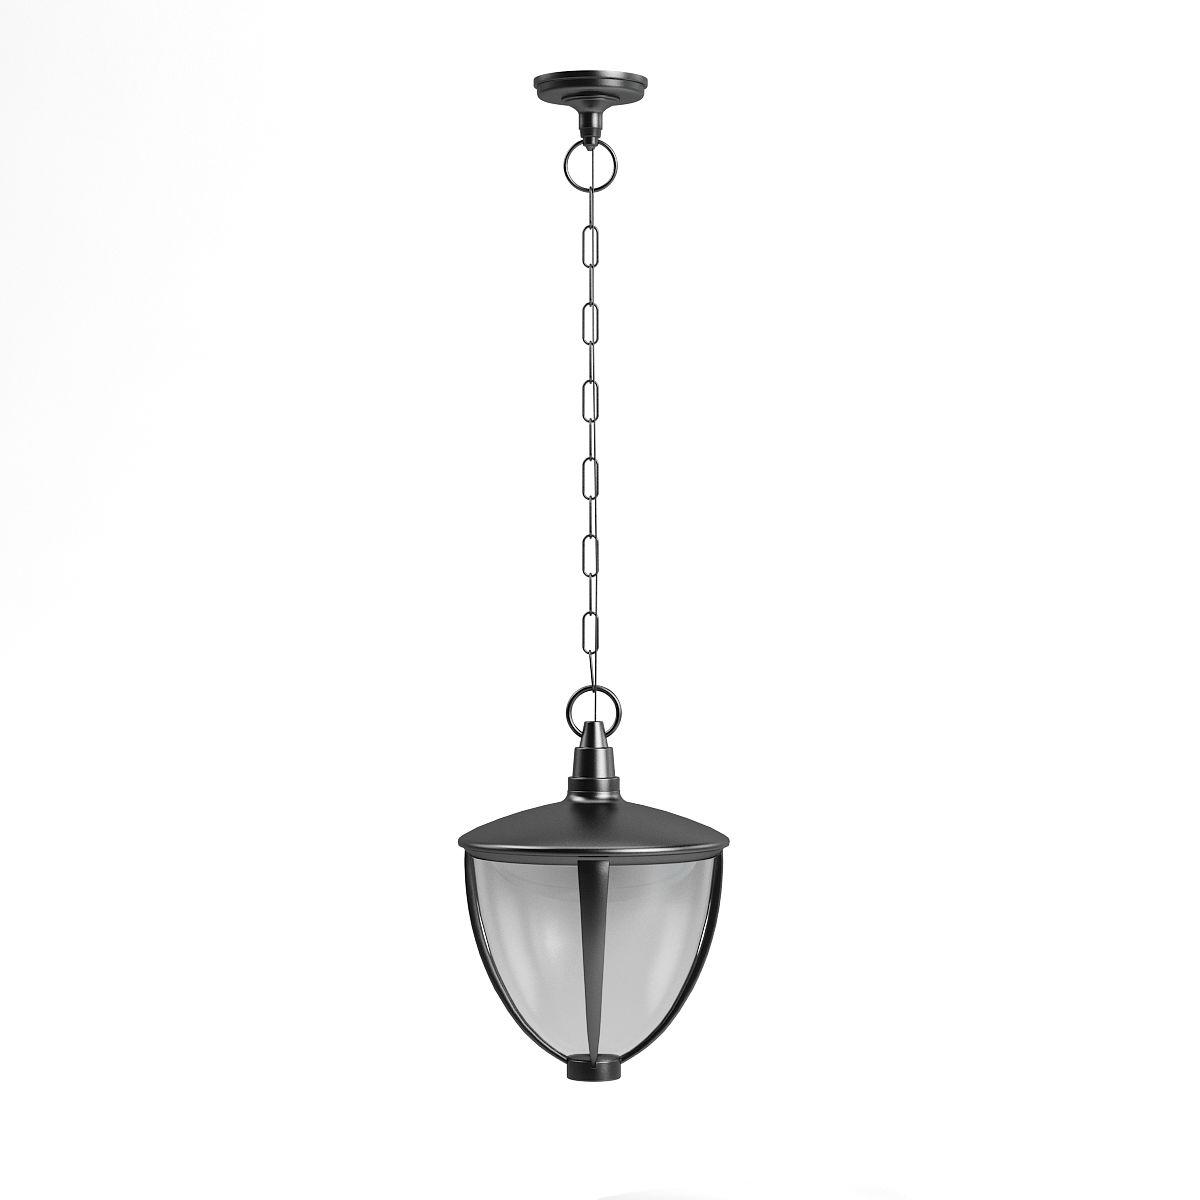 Ceiling Exterior Lamp 3d Model Lamp Ceiling 3d Model